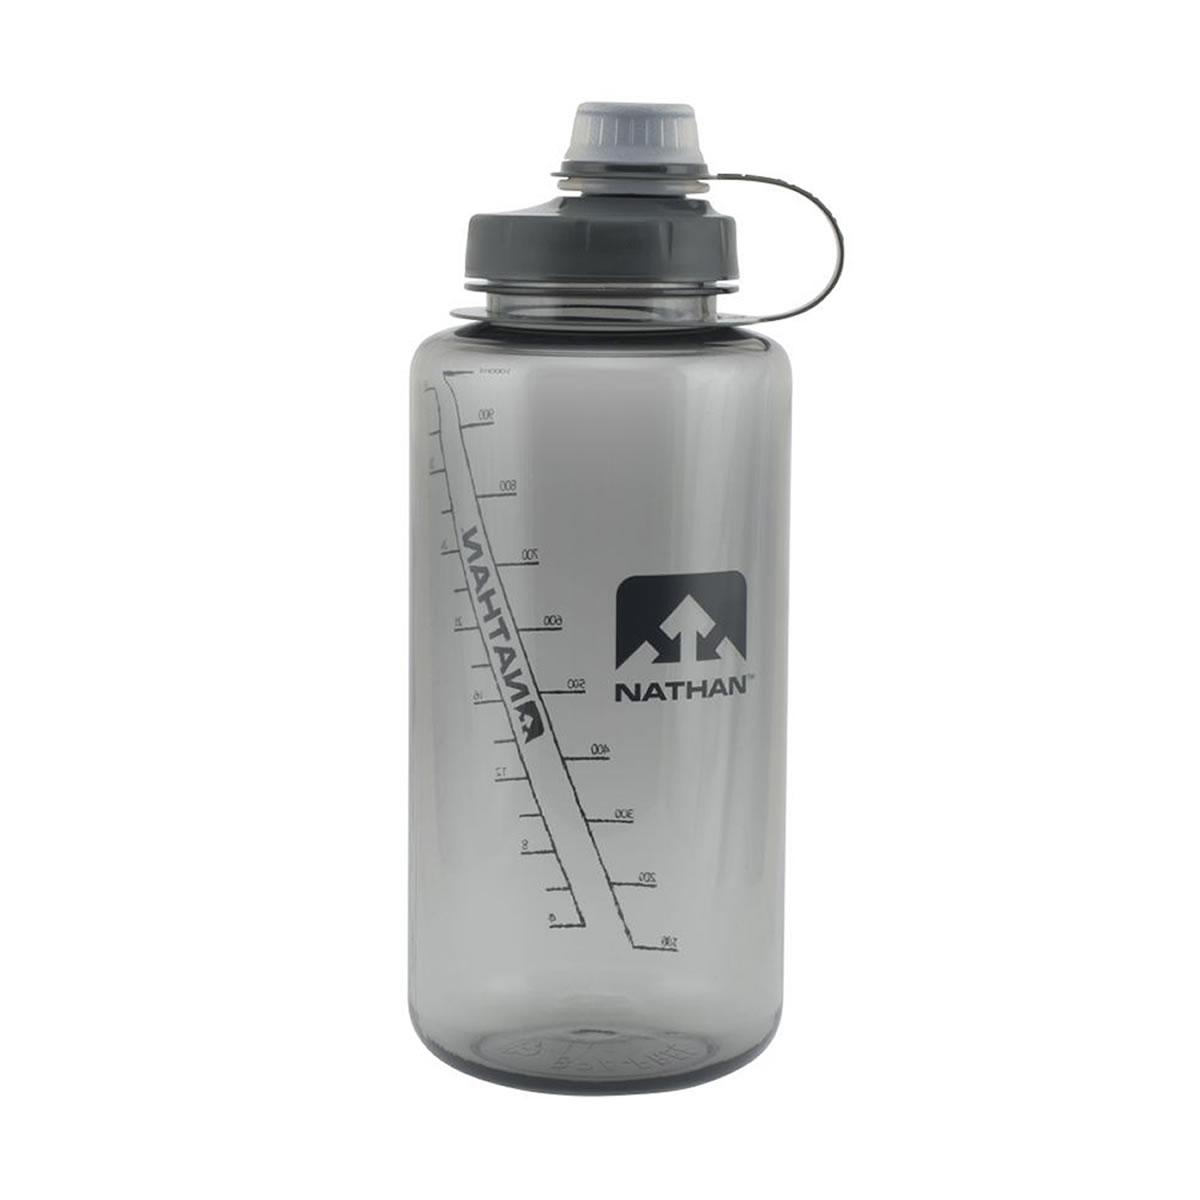 Trinkflasche Big Shot 1 Ltr - Nathan - grau